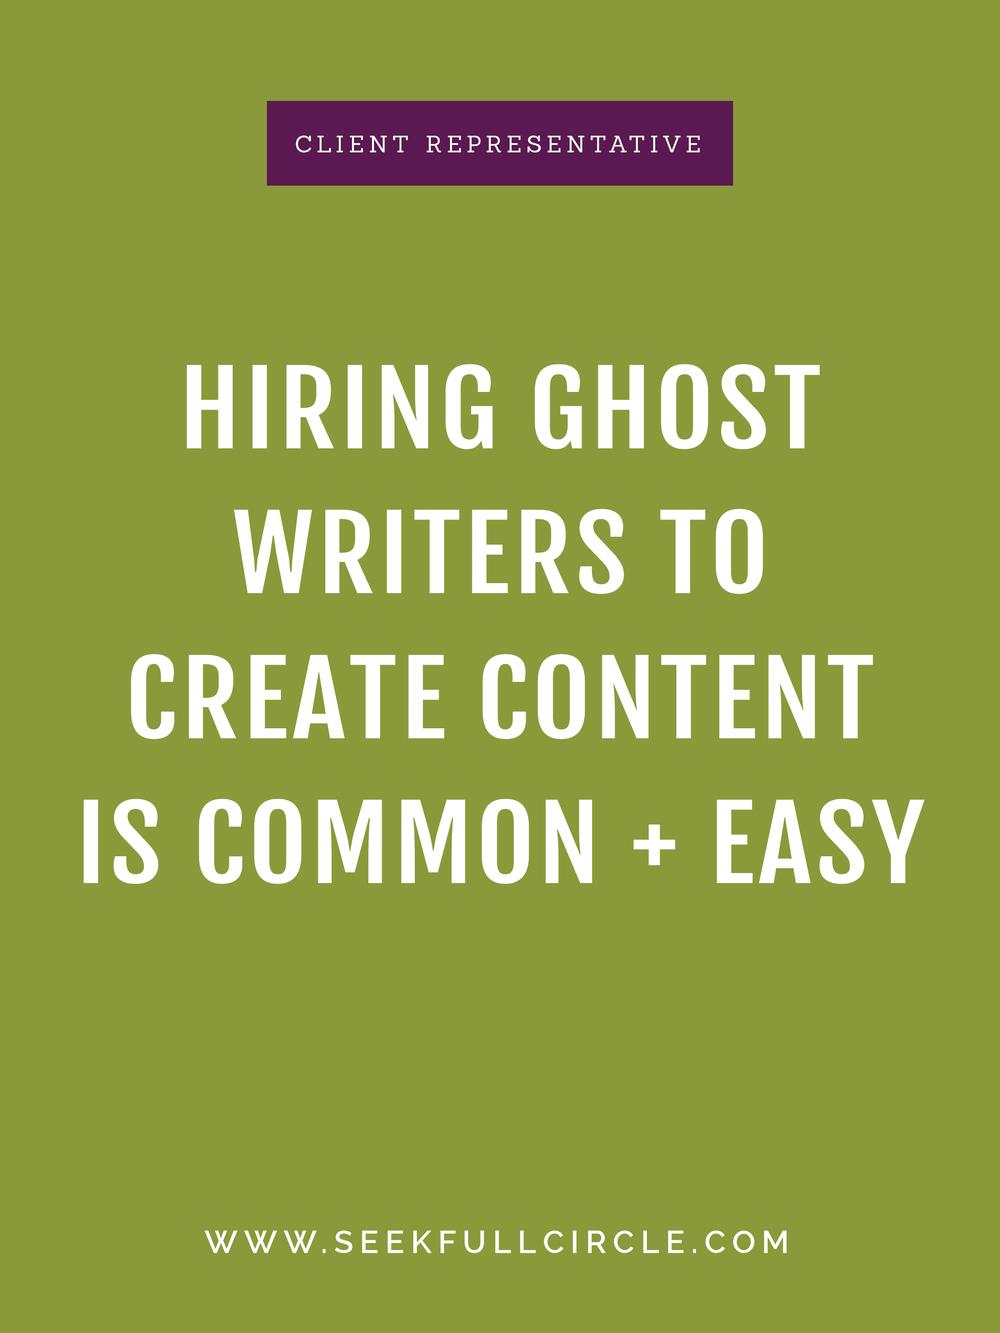 kim waltman fullcircle creative + coaching ghost writer des moines iowa blog